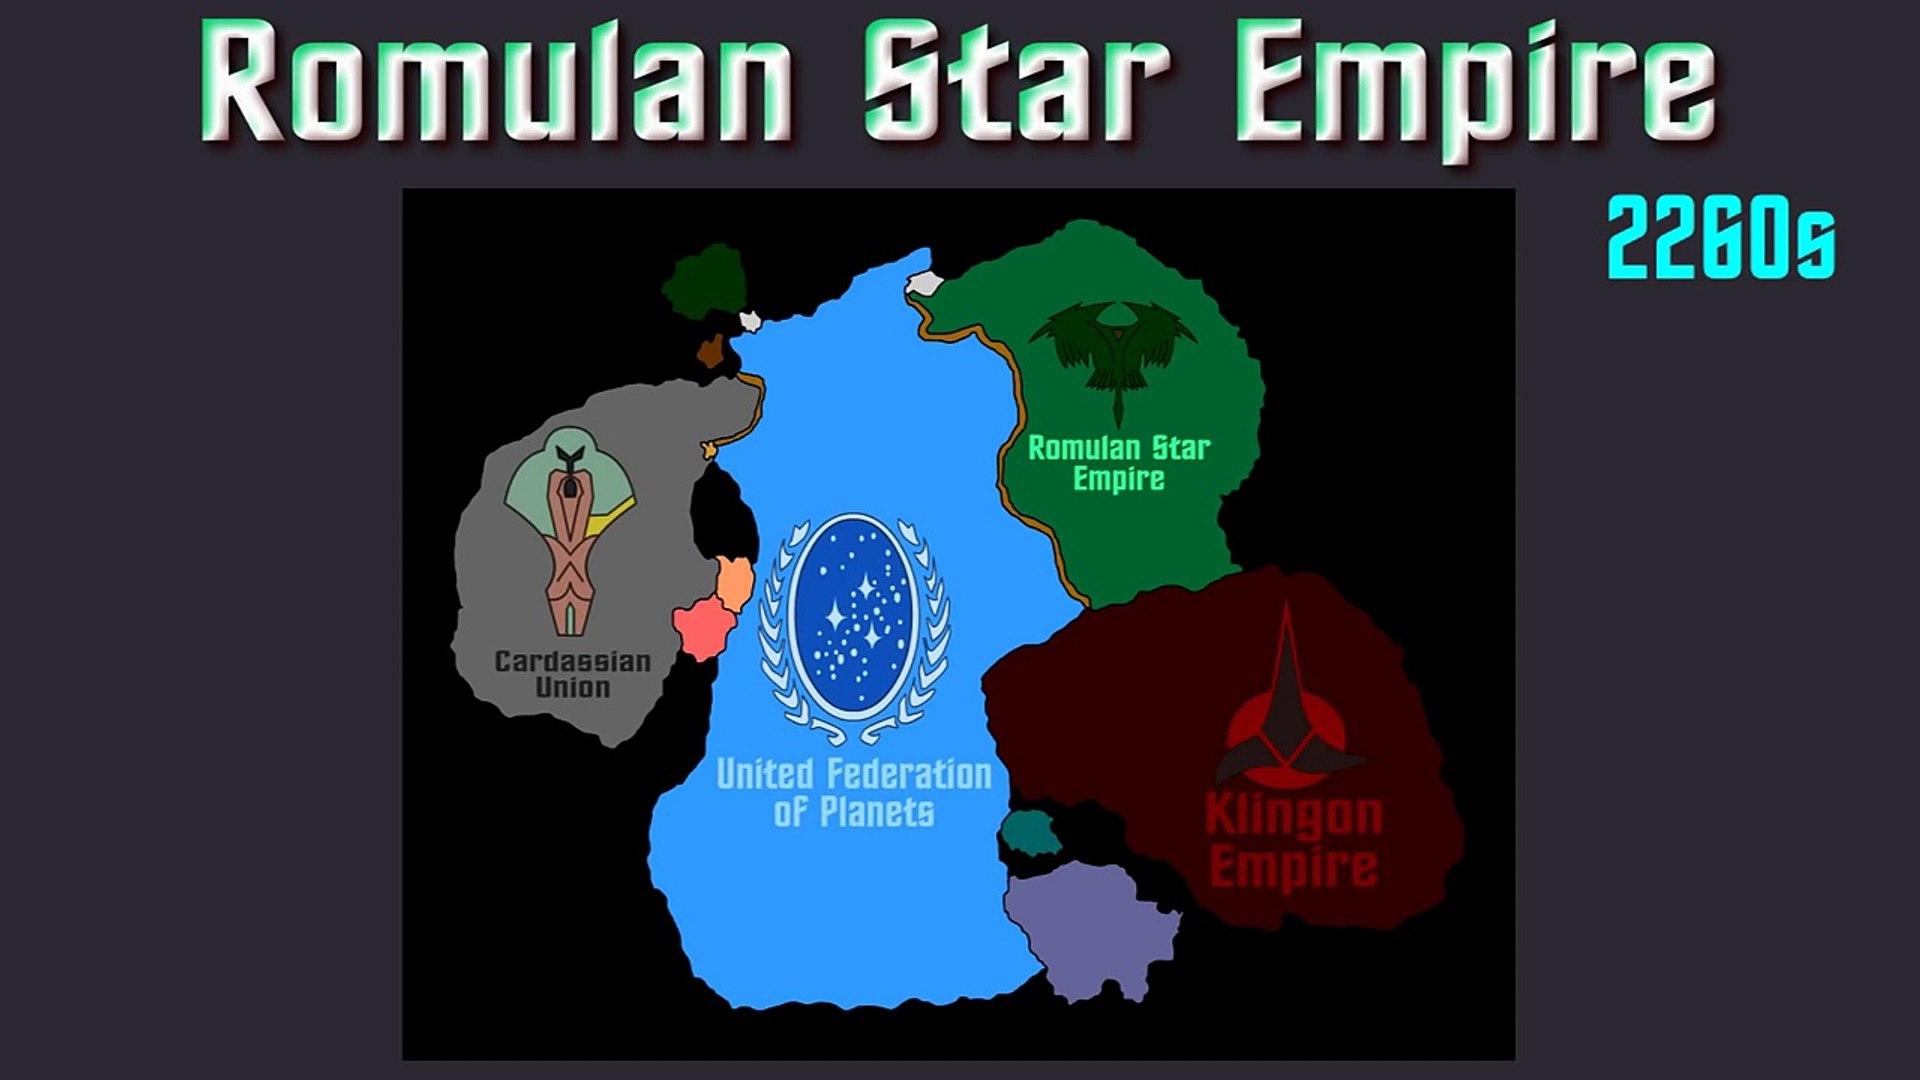 Star Trek Romulan Star Empire Video Dailymotion